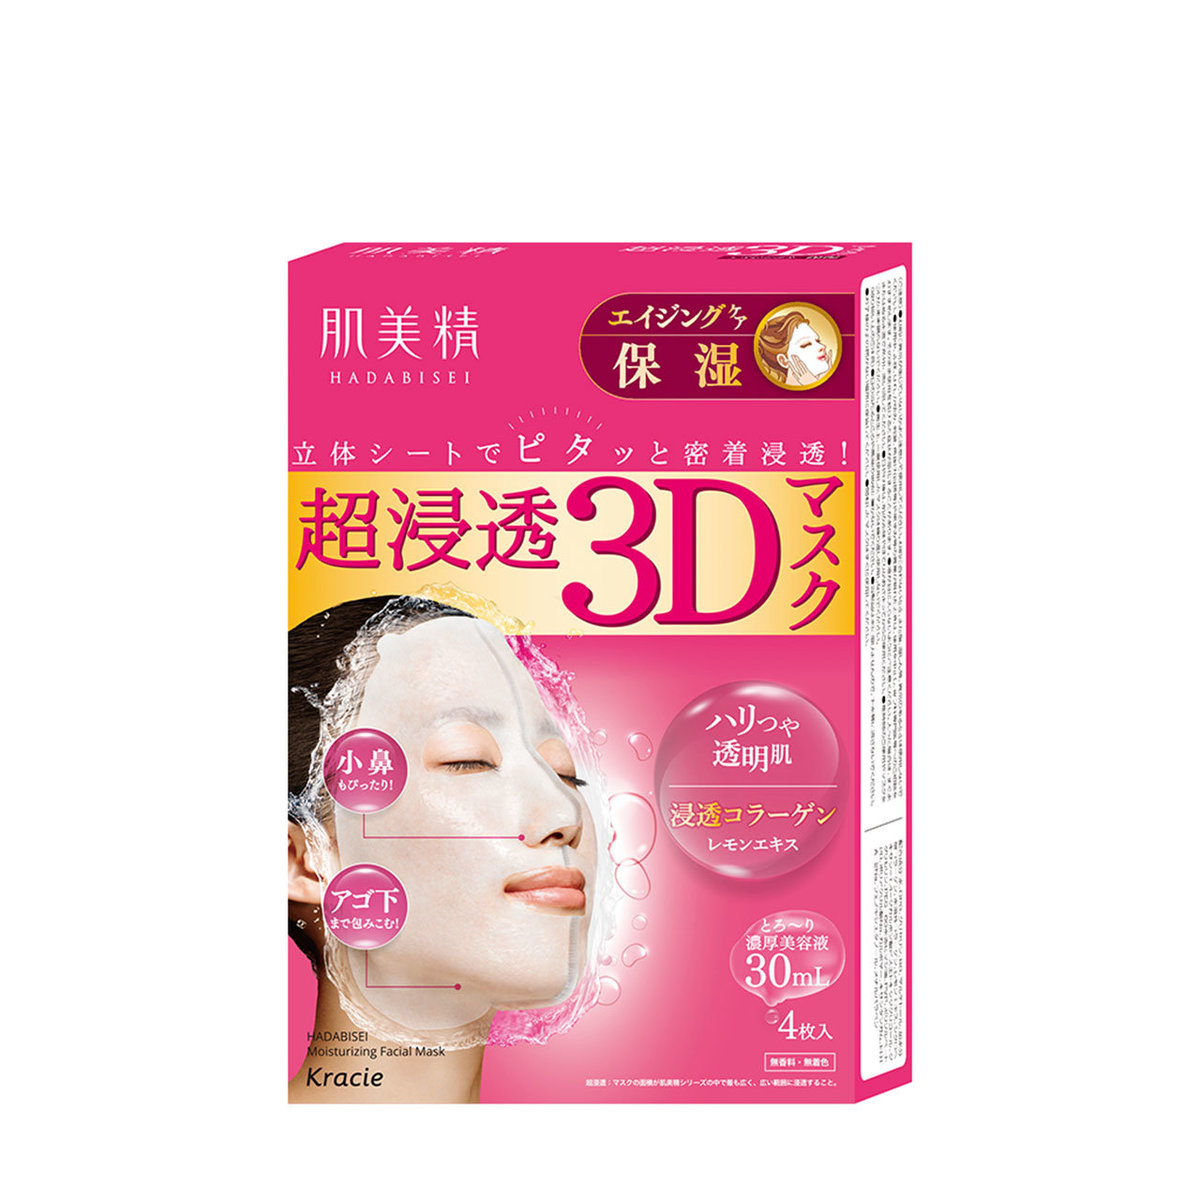 Hadabisei Advanced Penetrating 3D Face Mask (Aging-care Moisturizing) (30ml x 4pcs)